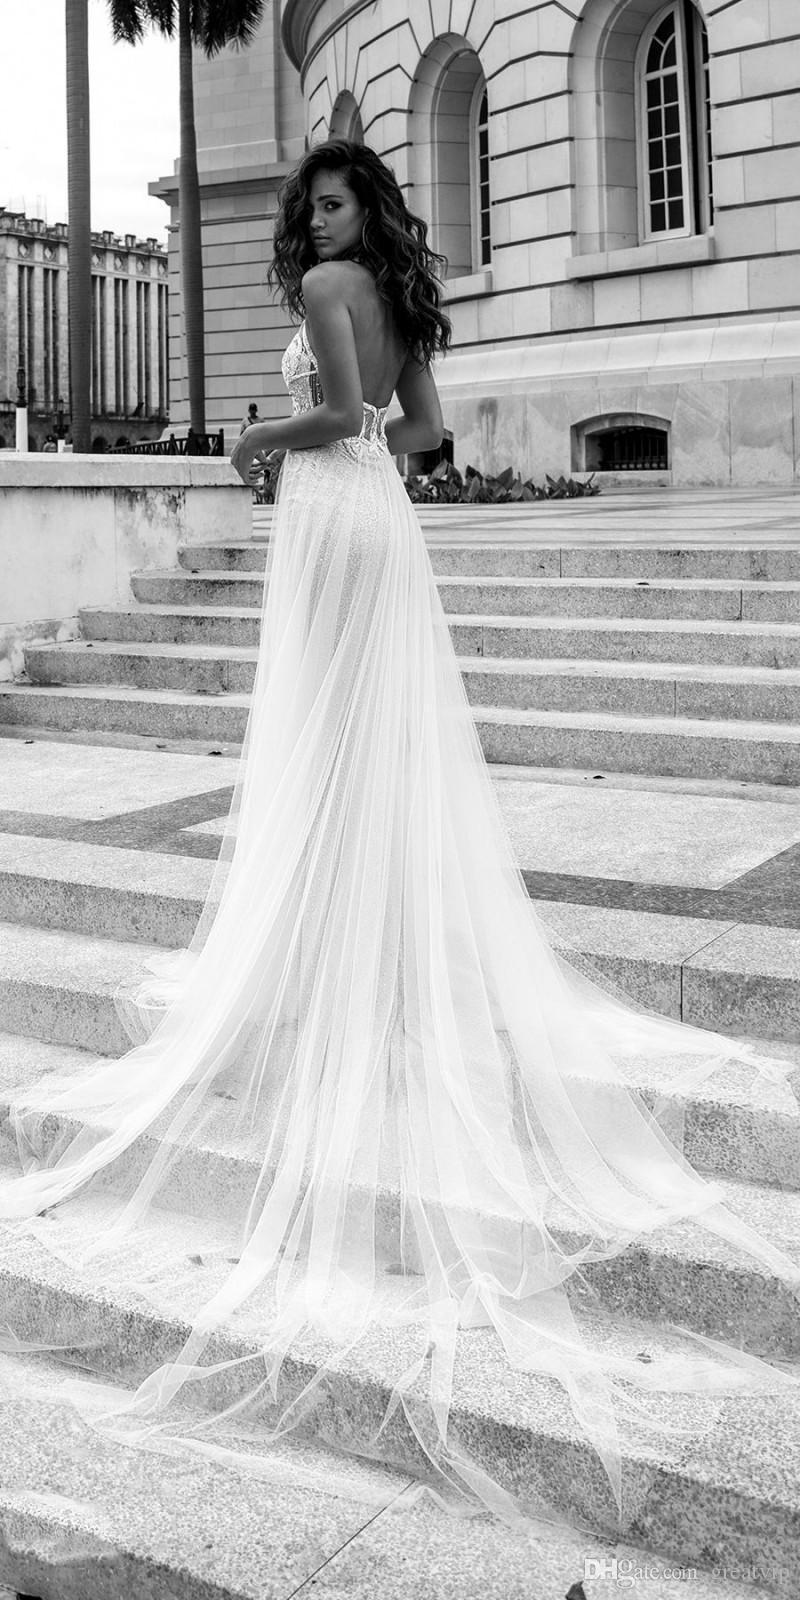 2019 Julie Vino Beach Wedding Dresses Backless Halter Neck Illusion Lace Applique Boho Wedding Gowns Sweep Train Tulle Bridal Dress